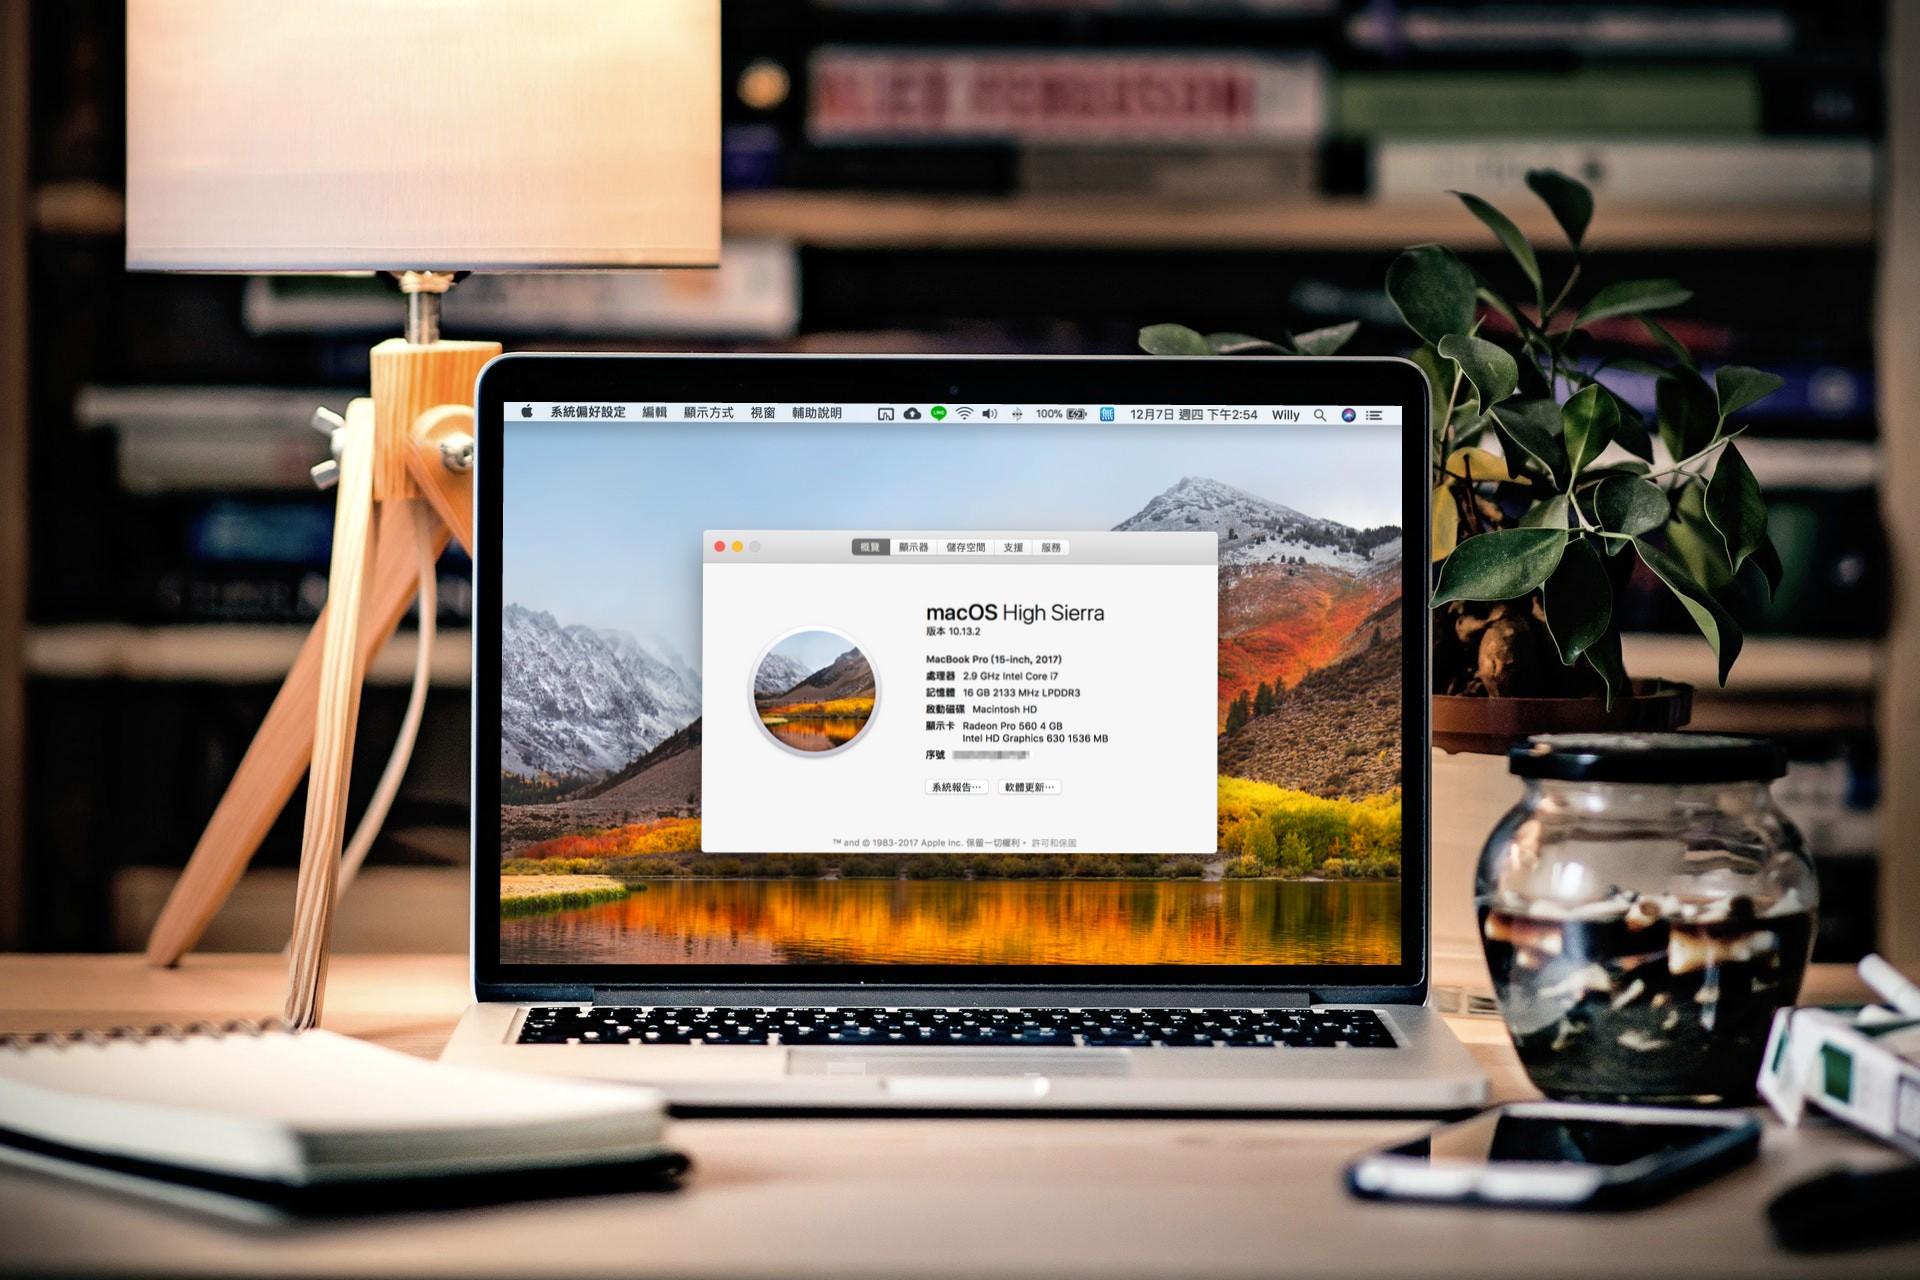 macOS 10.13.2